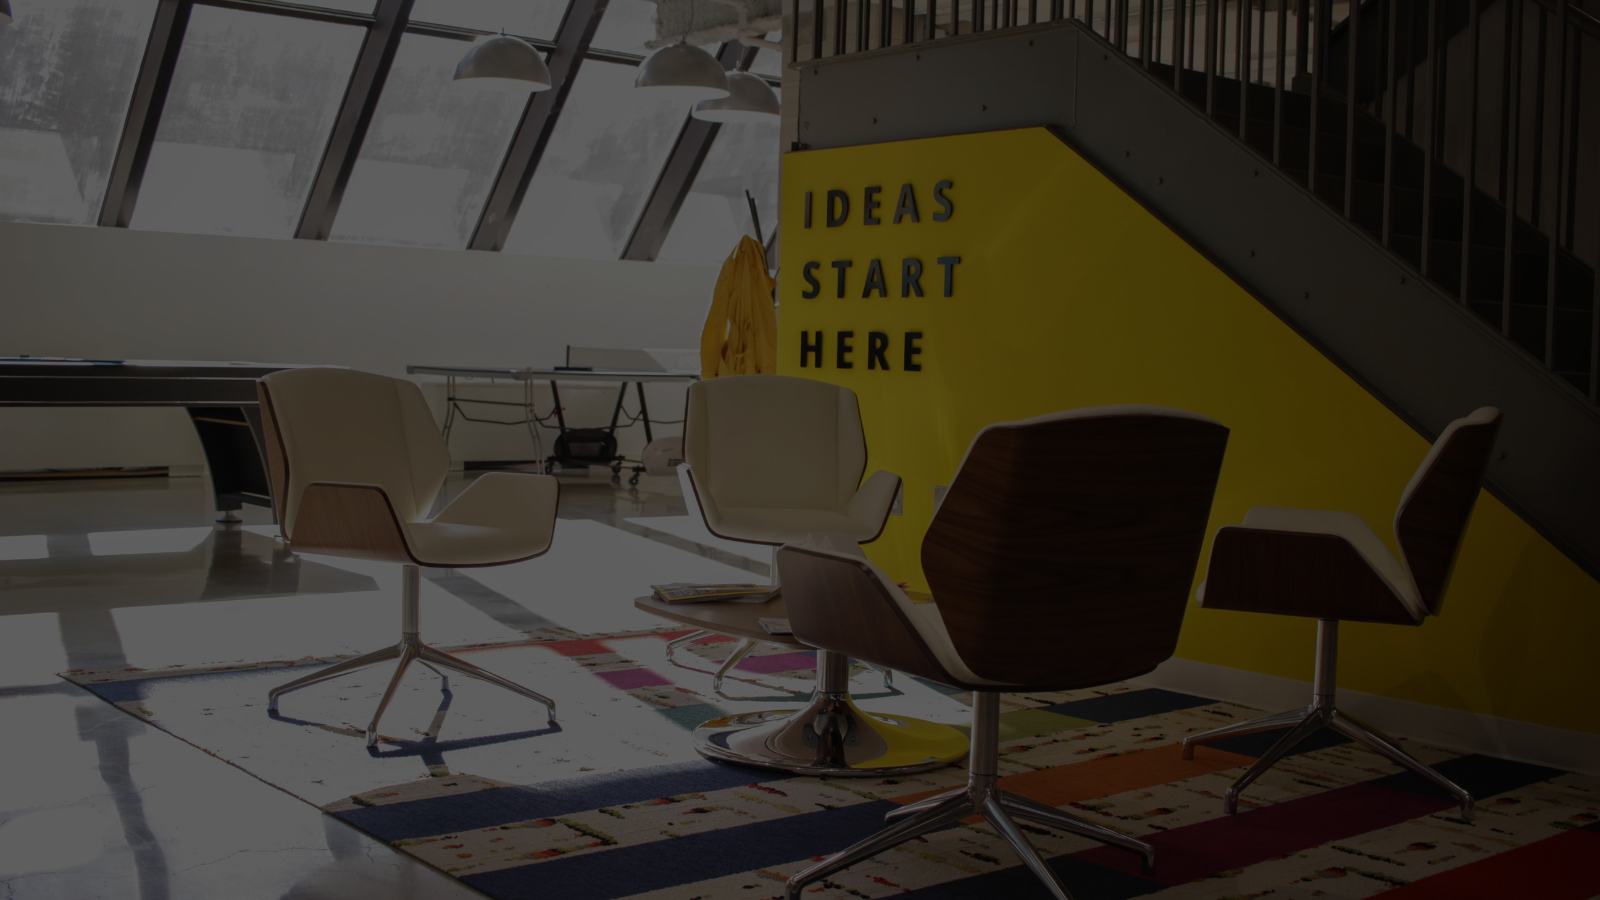 blog - Design thinking